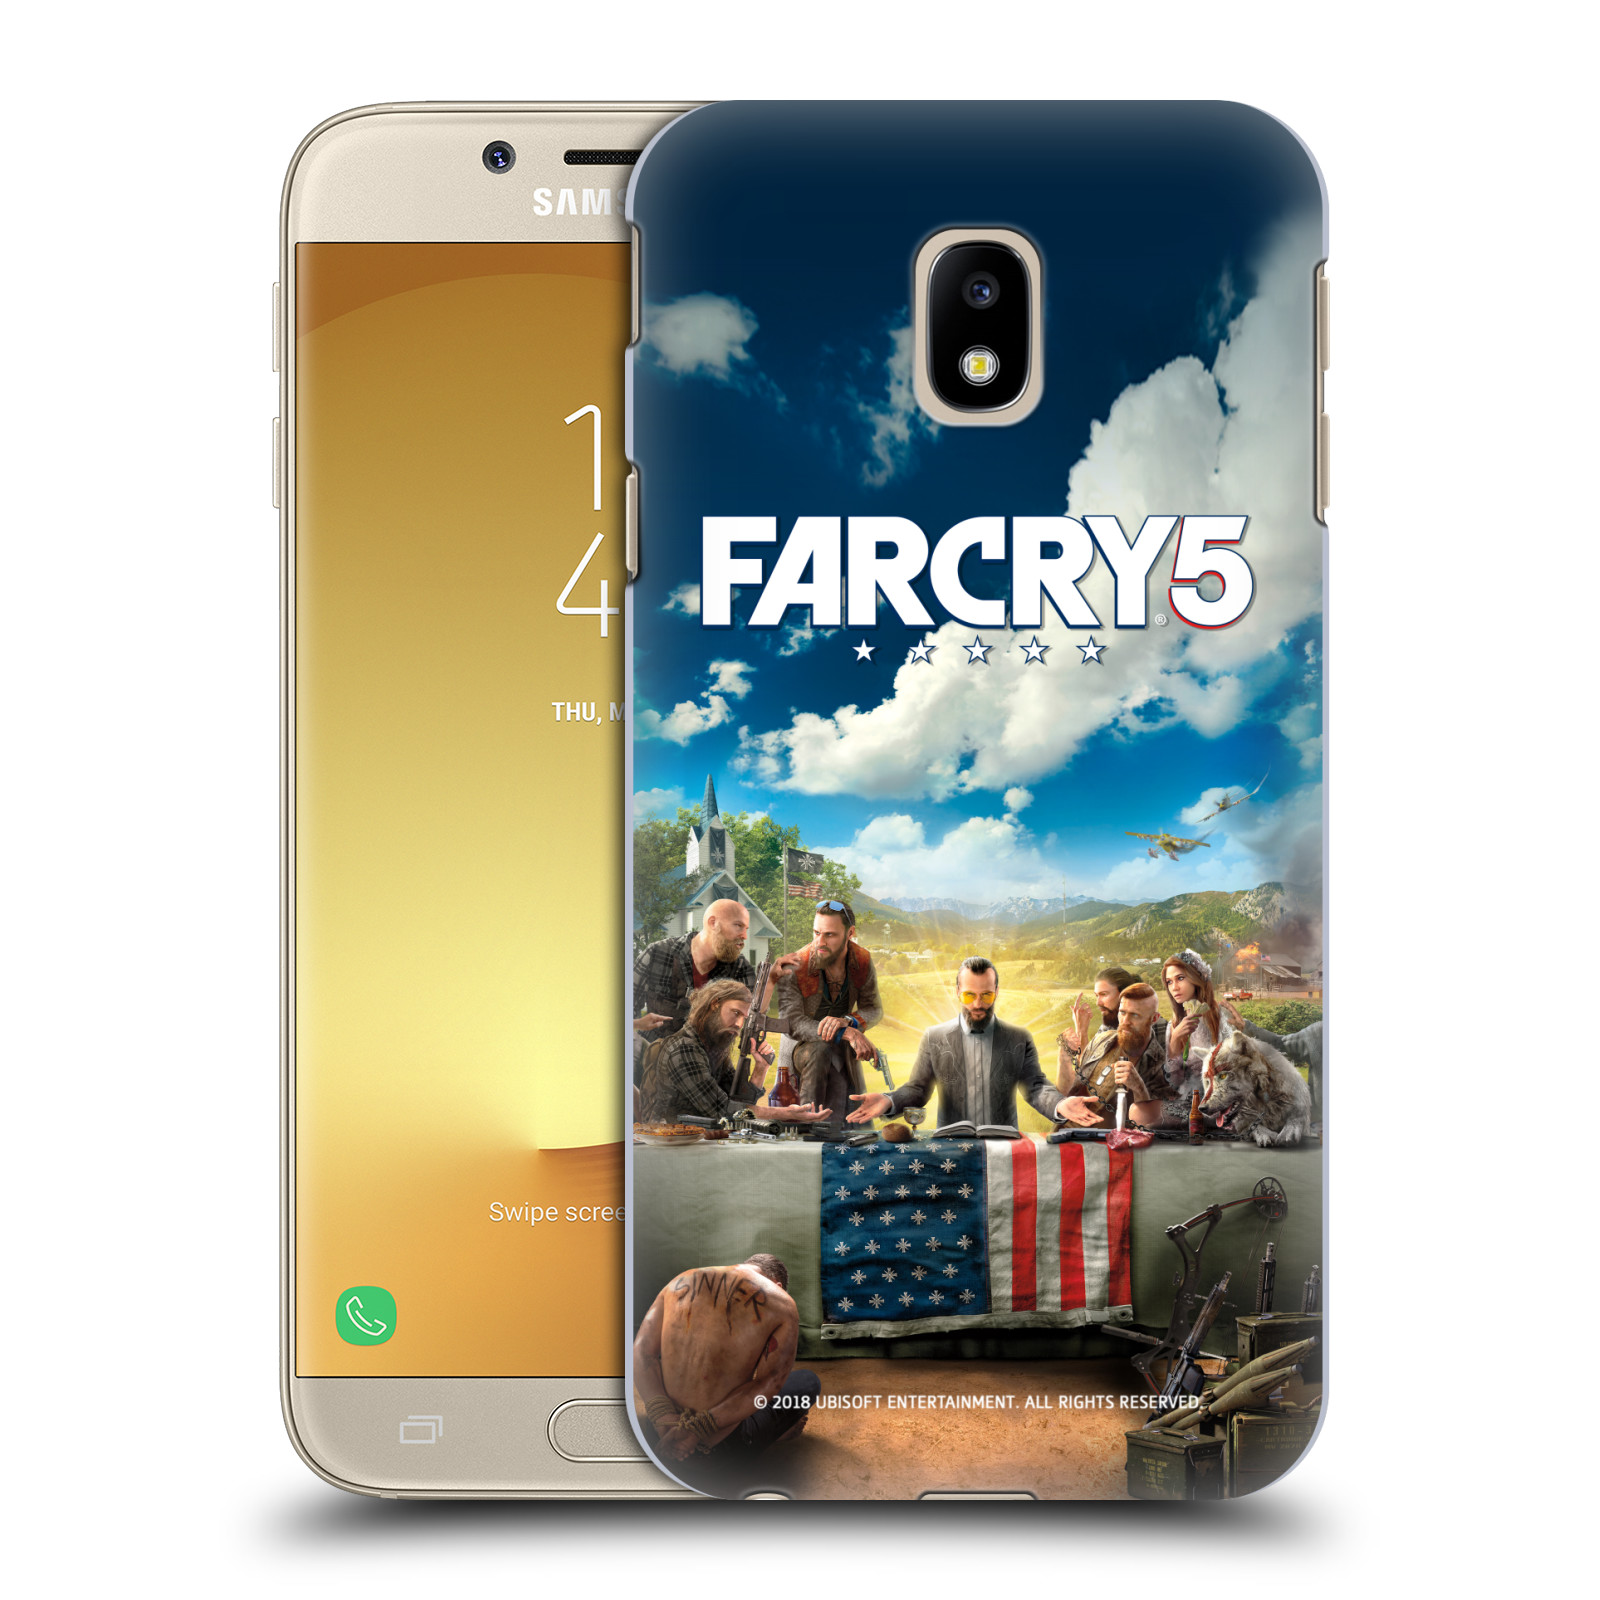 Pouzdro na mobil Samsung Galaxy J3 2017 (J330, J330F) - HEAD CASE - Far Cry 5 poslední večeře